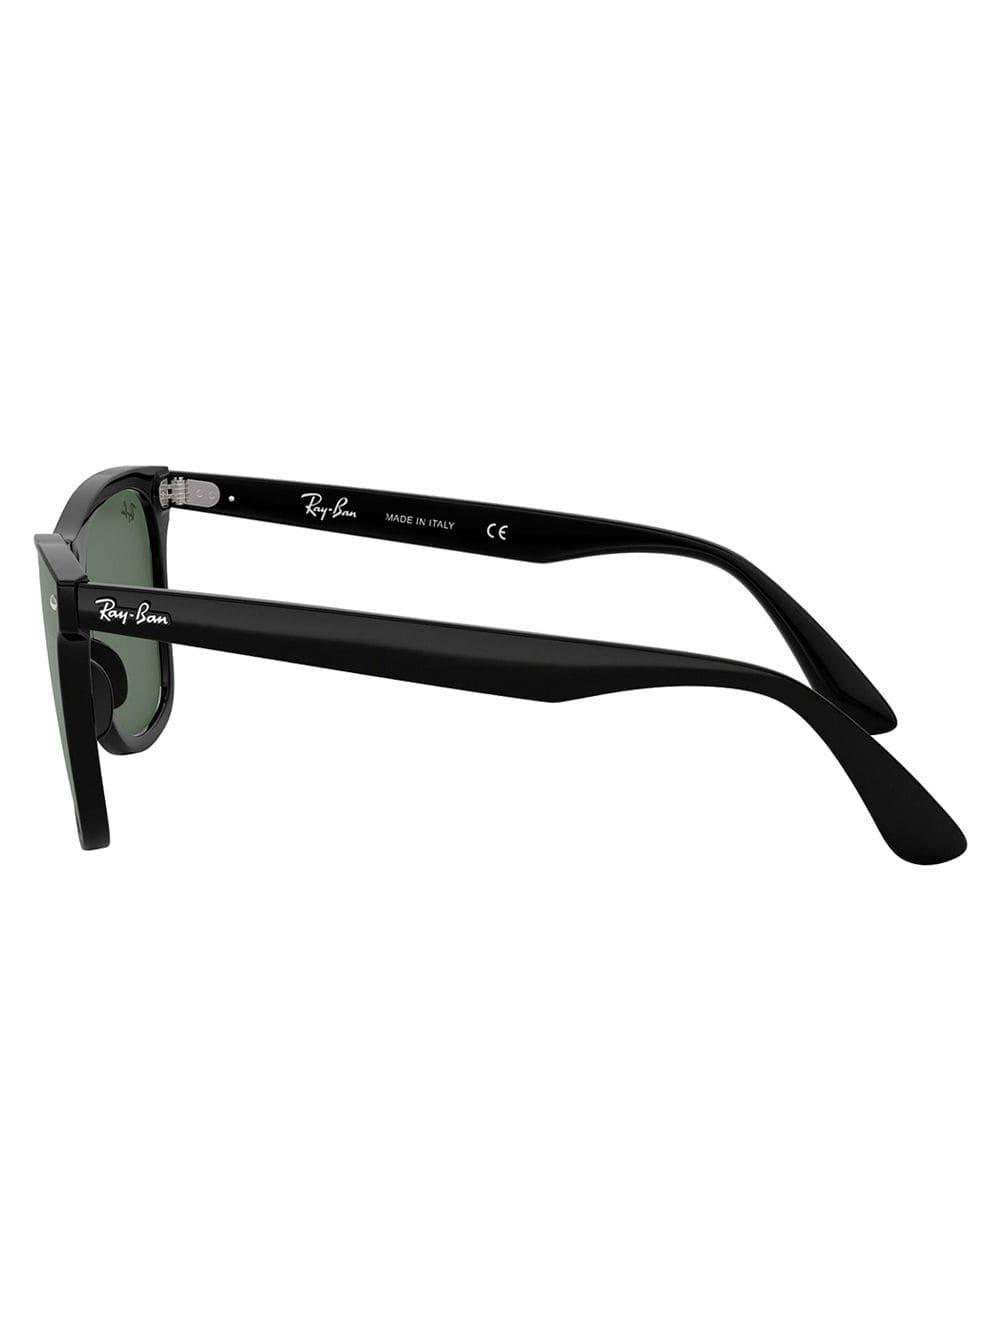 Ray-Ban - Black Óculos De Sol Rb4440n - Lyst. View fullscreen 5f0717a8f3